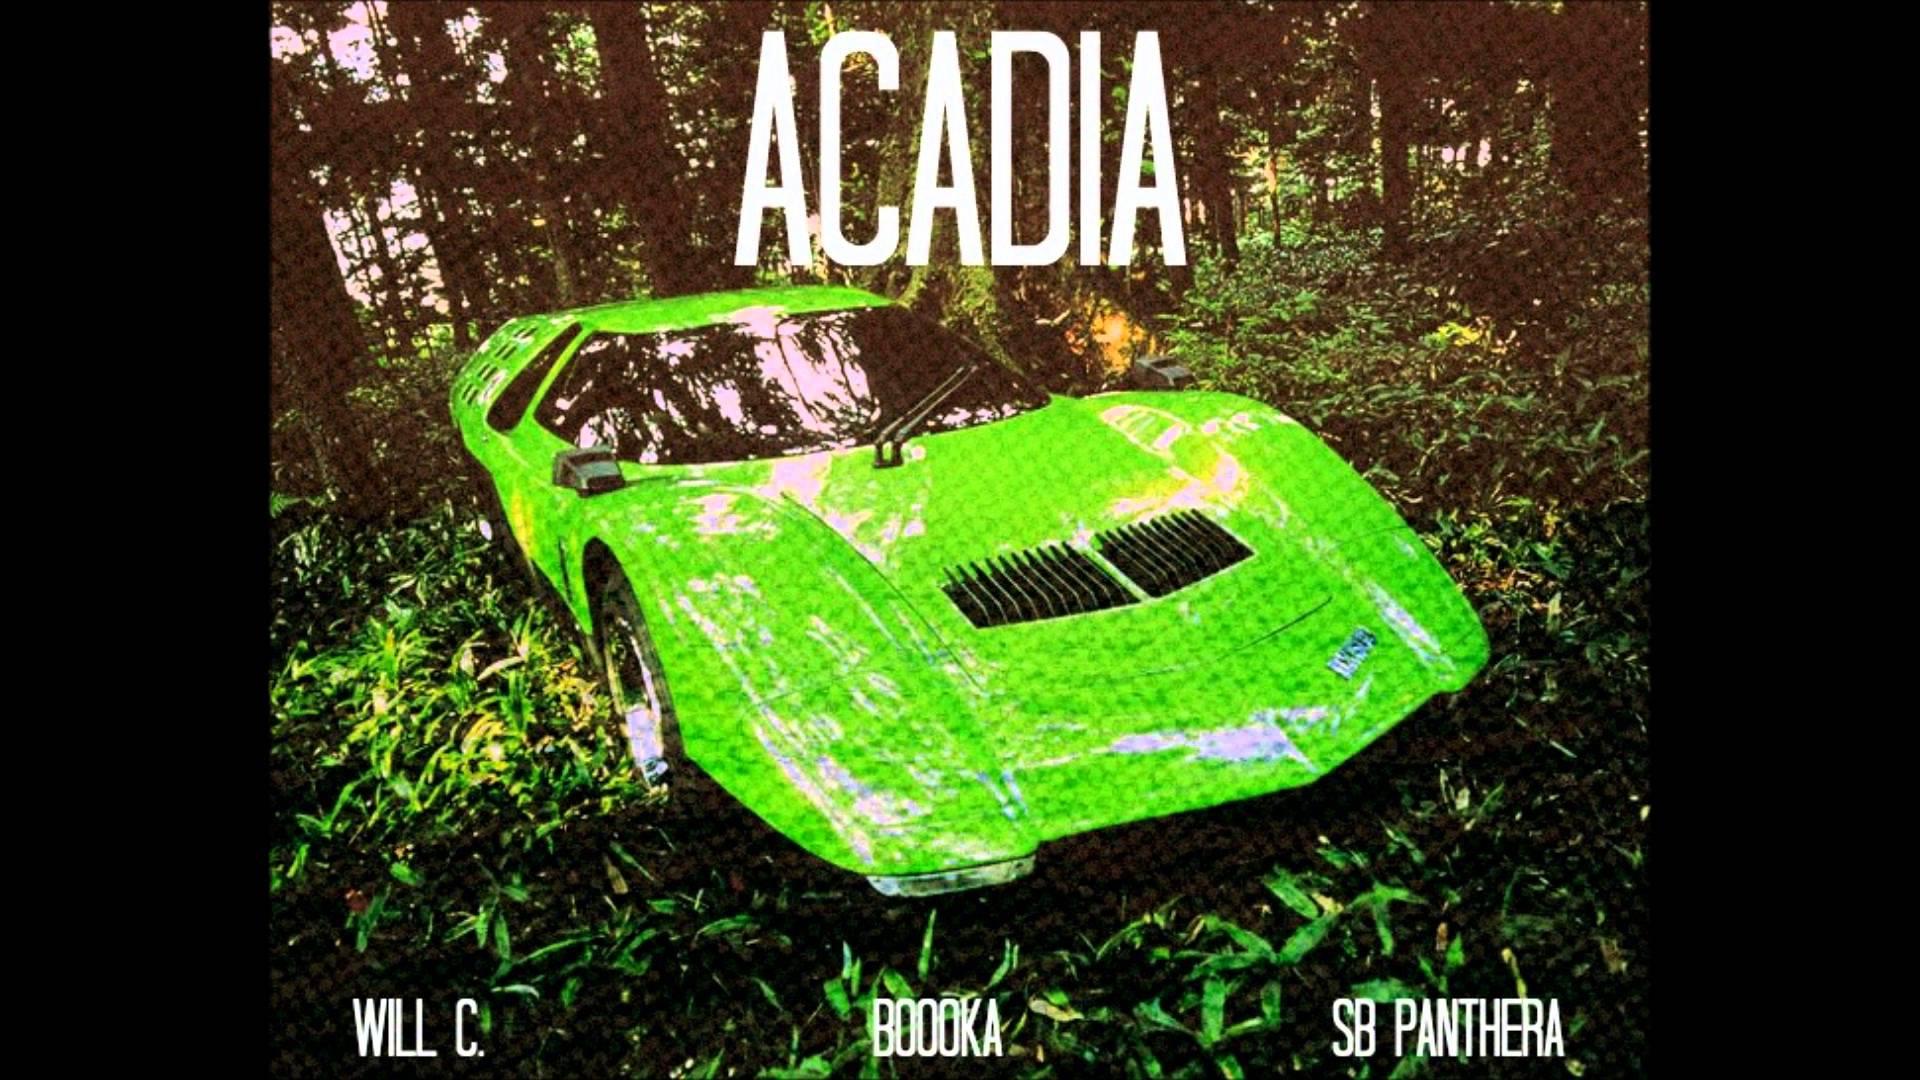 Will C. Feat. Boooka & SB Panthera – Acadia